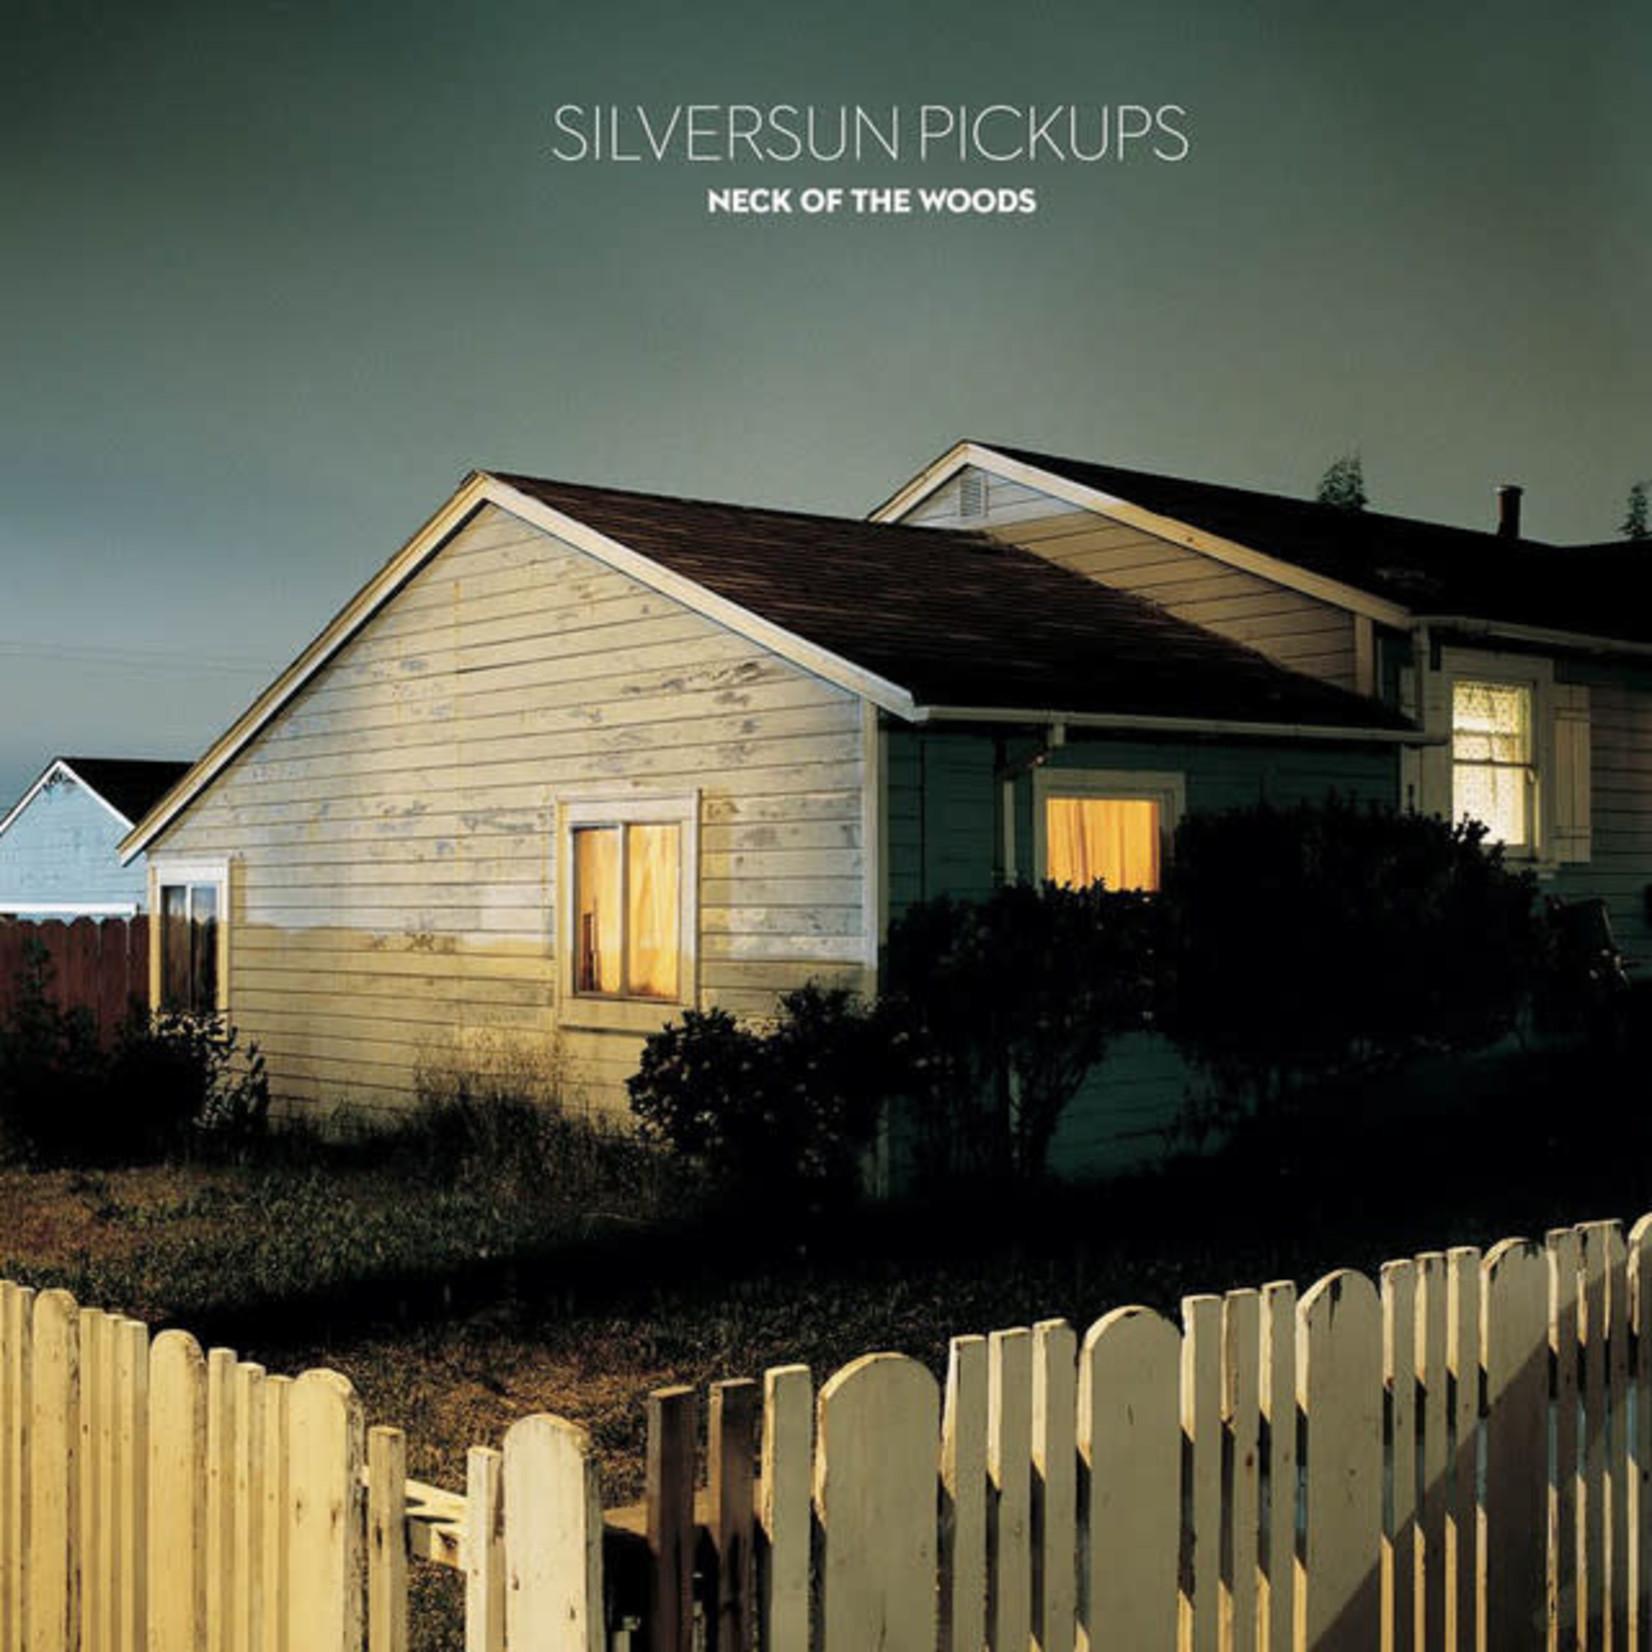 Vinyl Silversun Pickups - Neck Of The Woods